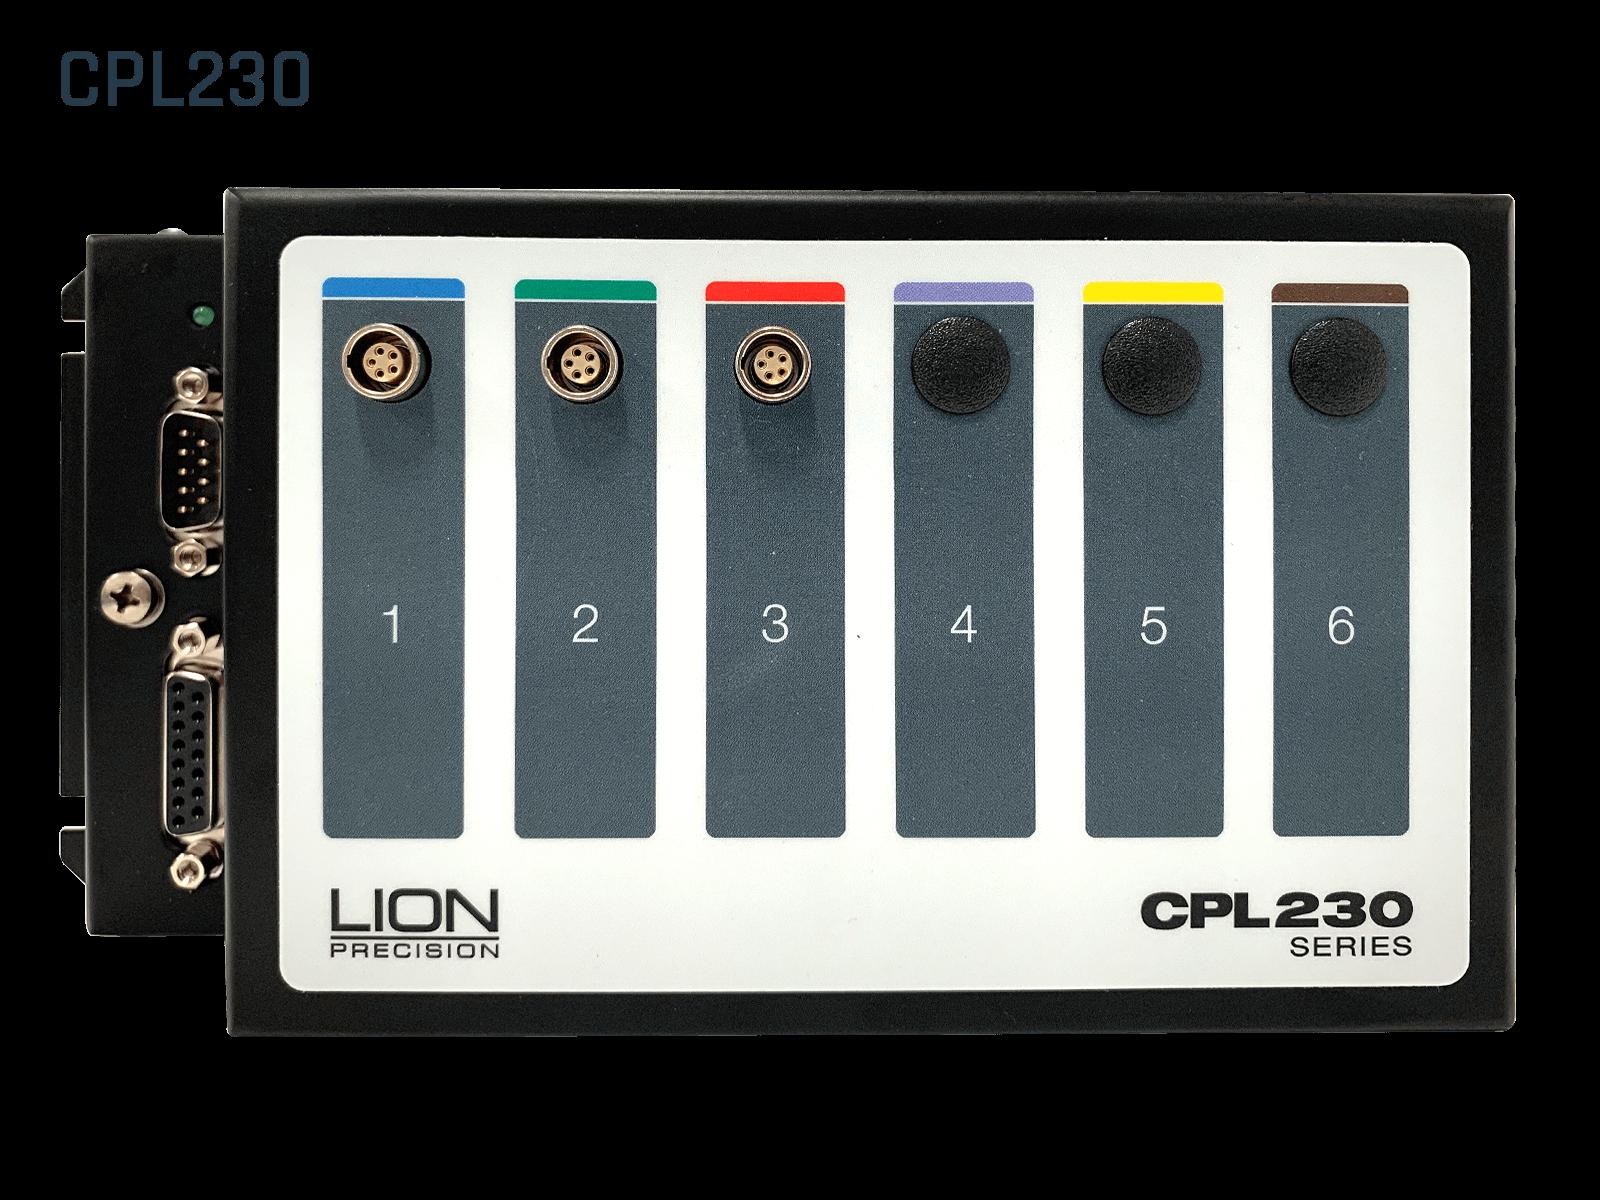 CPL230